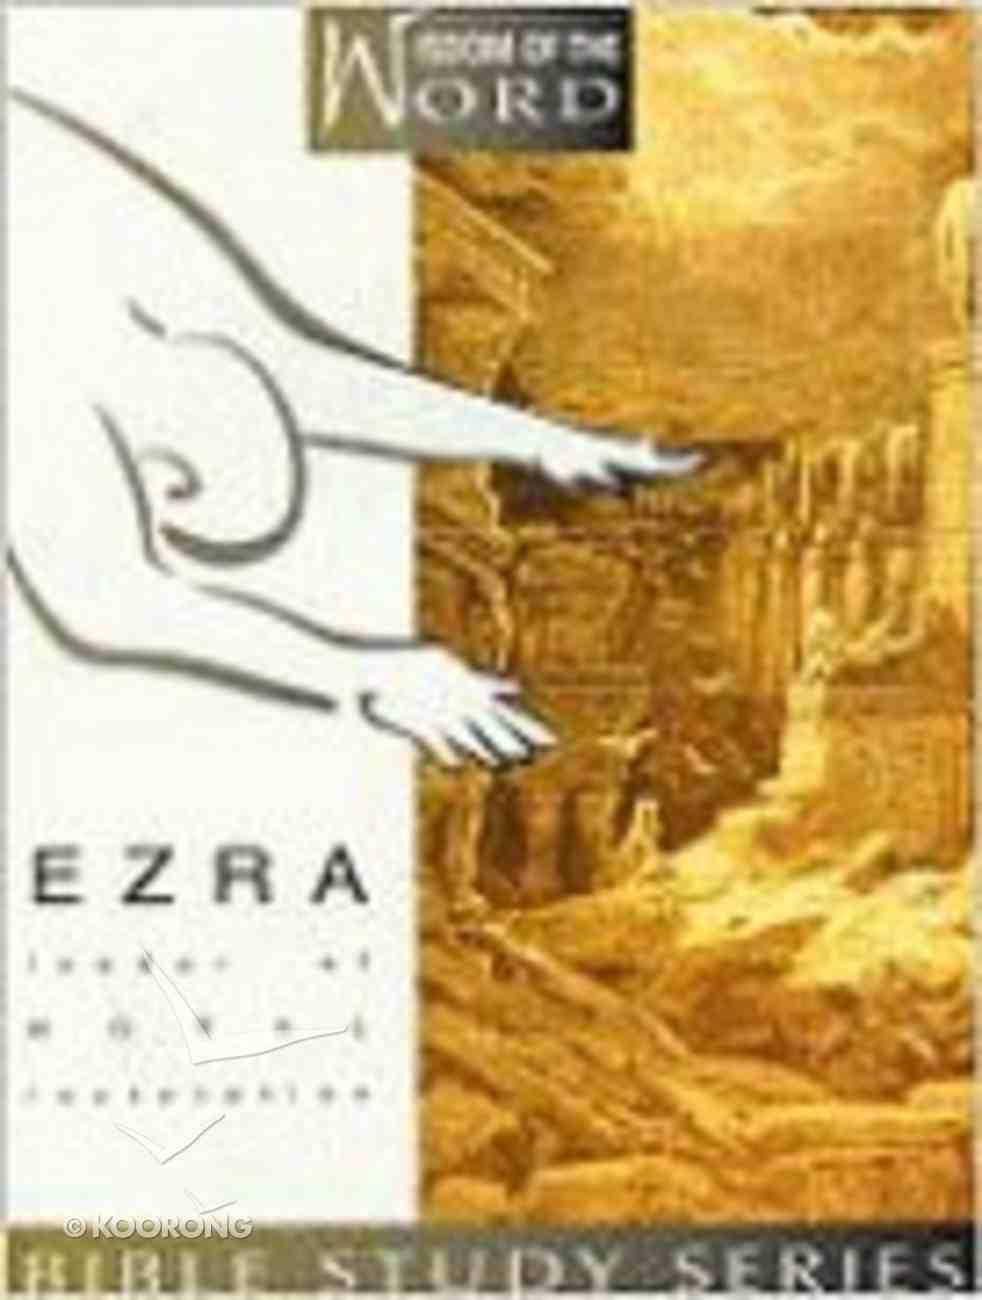 Ezra (Wisdom of the Word) (Wisdom Of The Word Series) Spiral